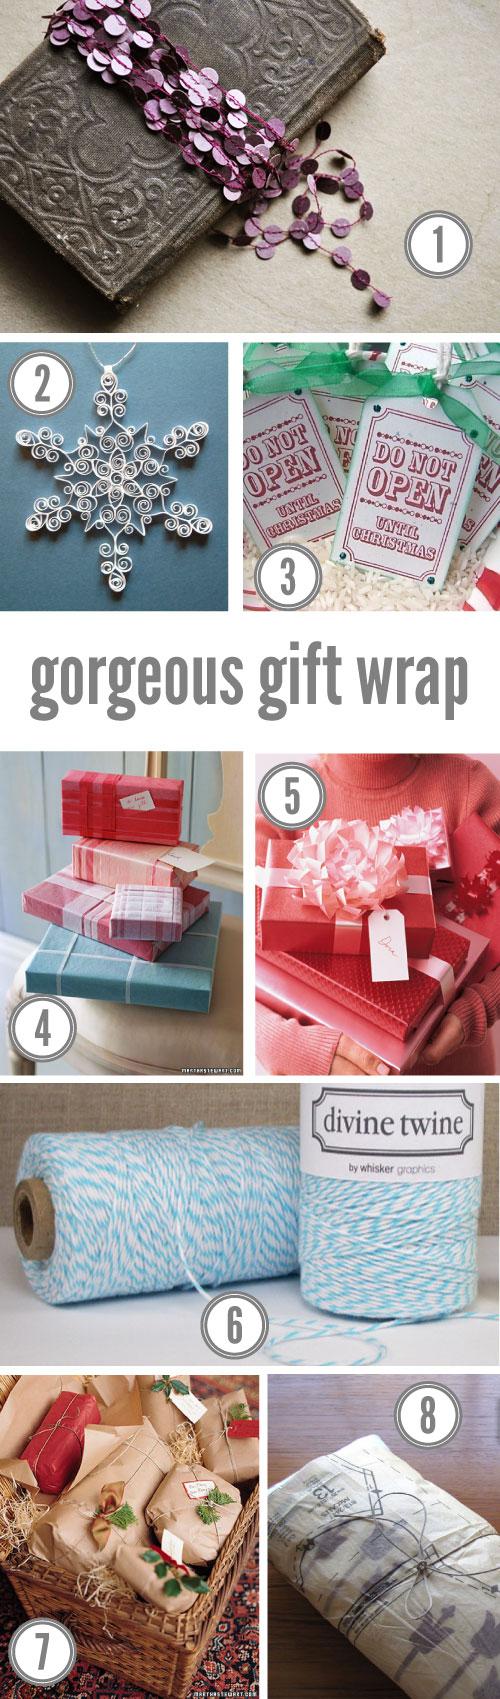 creative_gift_wrap